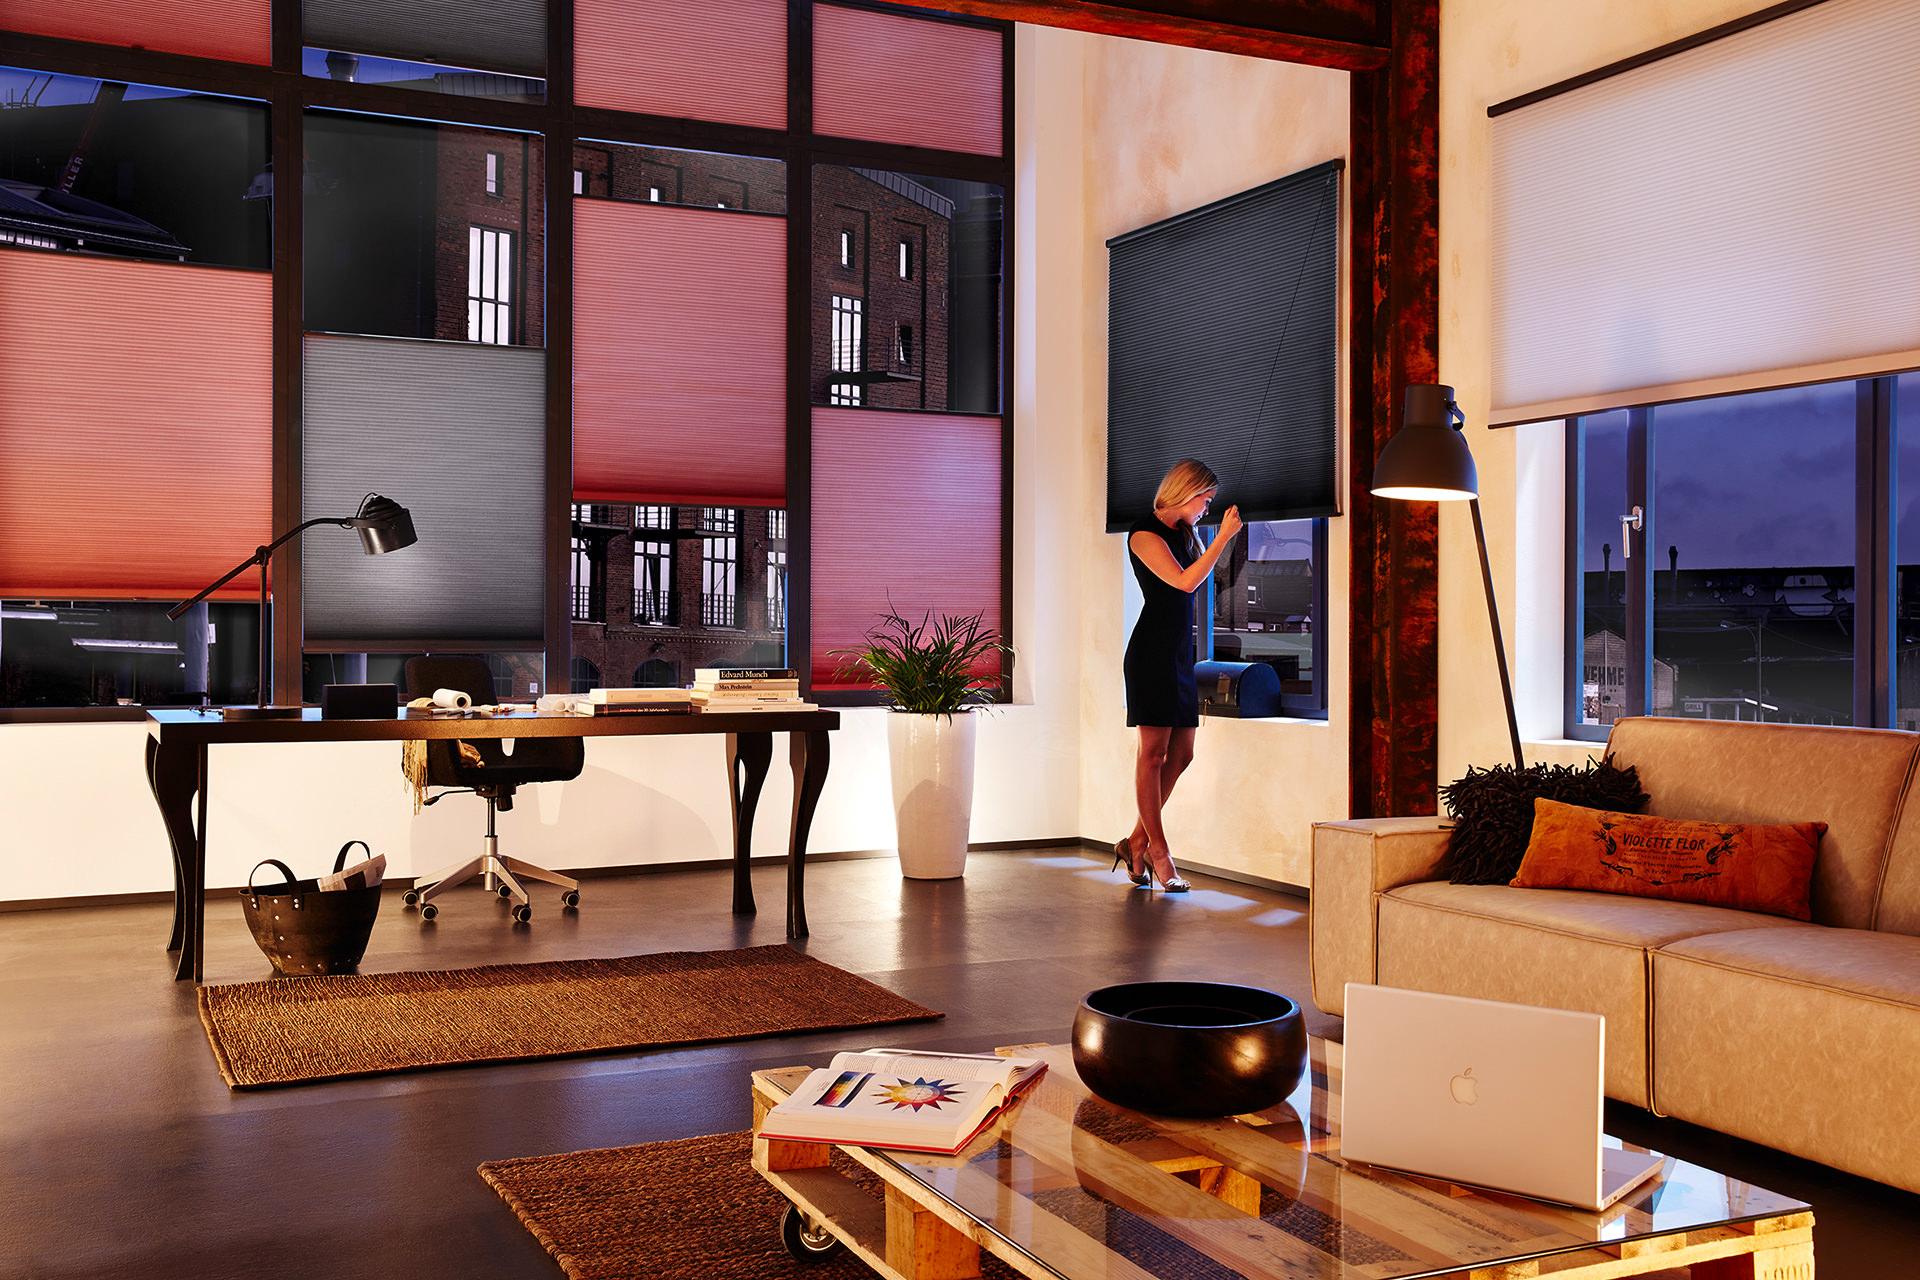 markisen n rnberg sonnenschutz n rnberg folienrollo heinikel in 90419 markisen jalousien. Black Bedroom Furniture Sets. Home Design Ideas